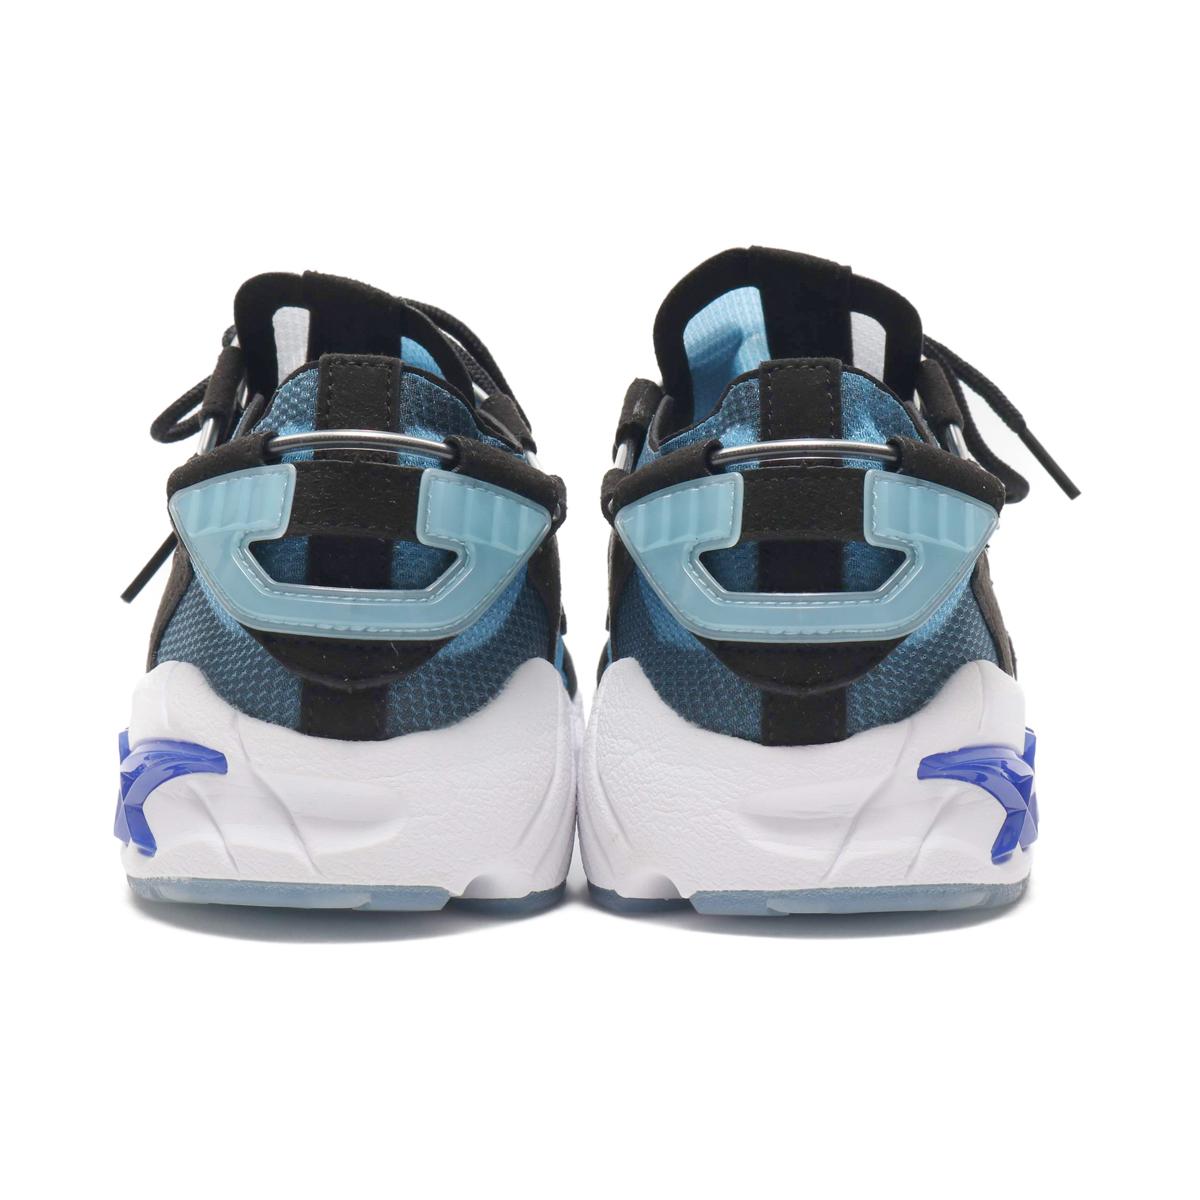 f:id:sneakerscaffetokyo:20190704091143j:plain